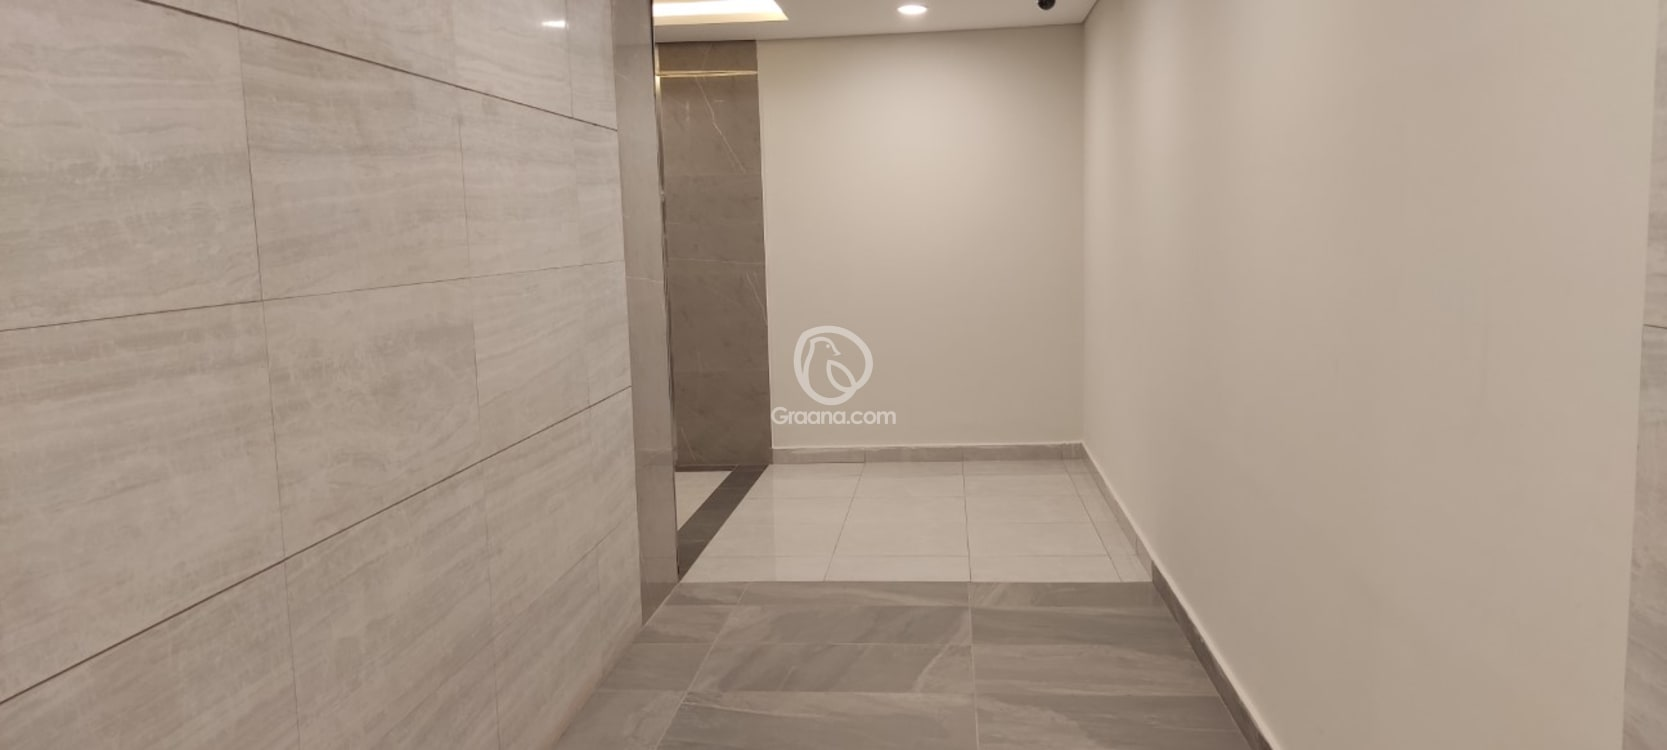 1634 Sqft Apartment for Sale    Graana.com